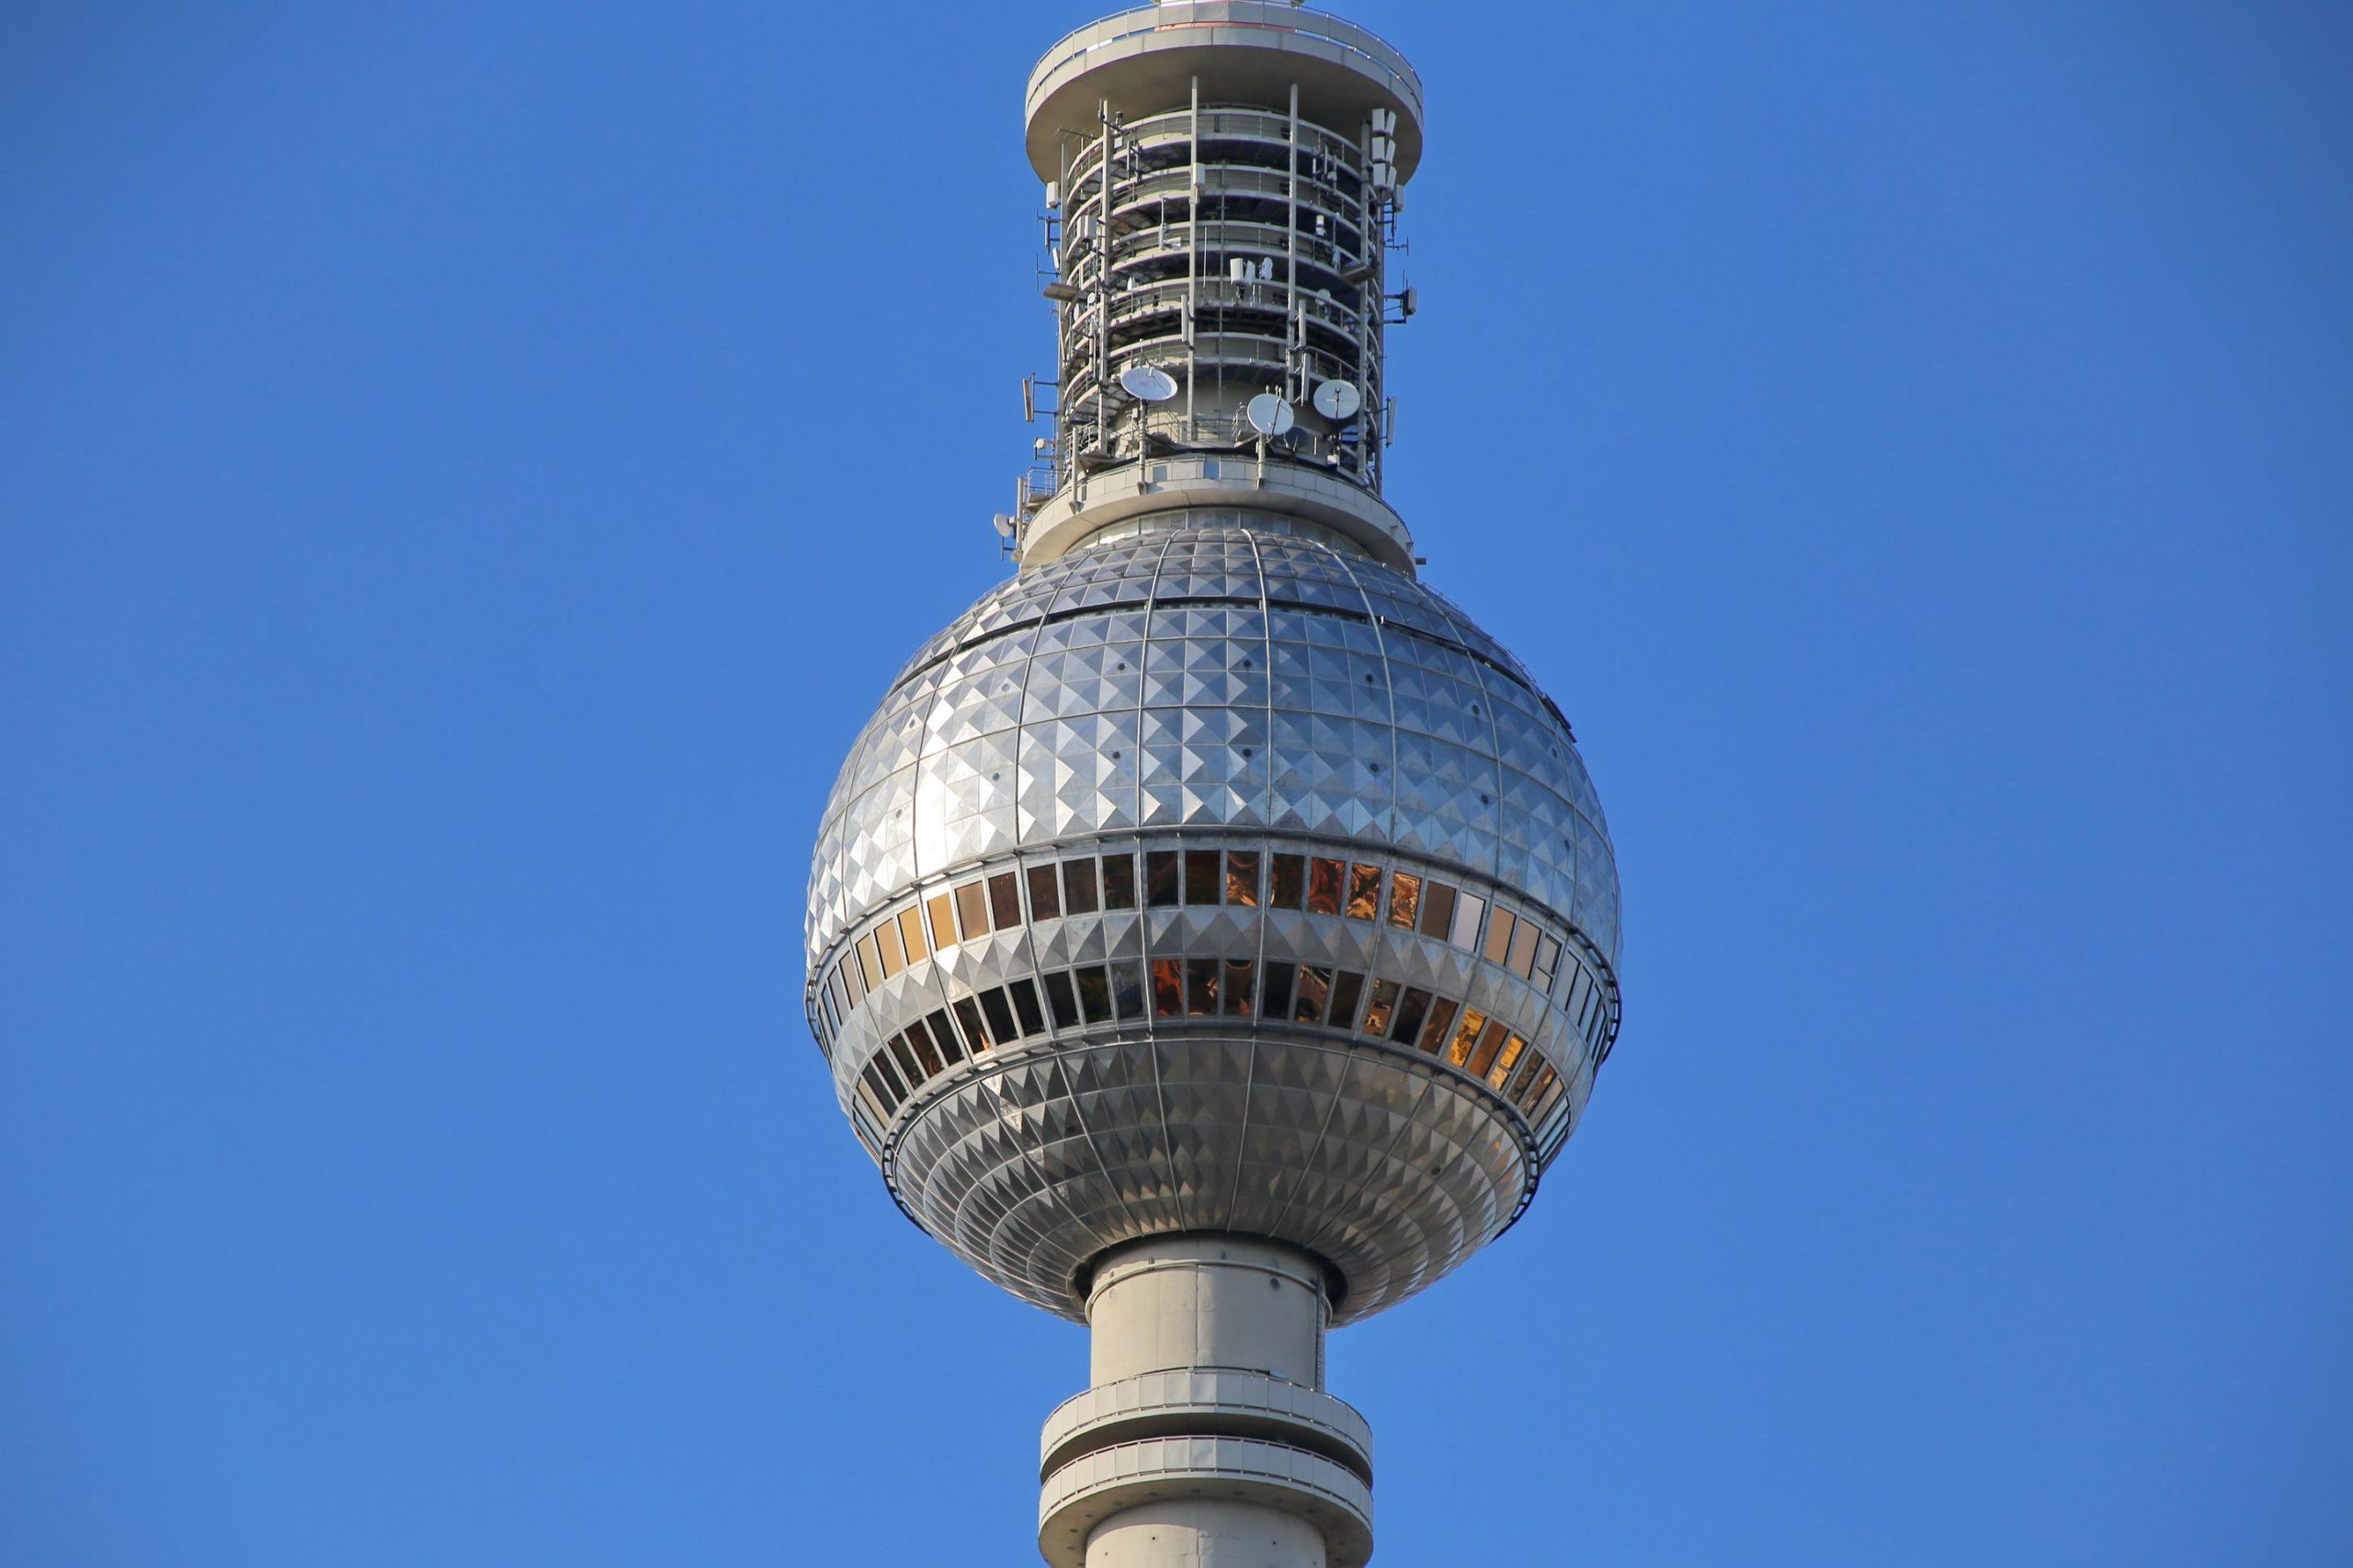 Cellular Data Tower